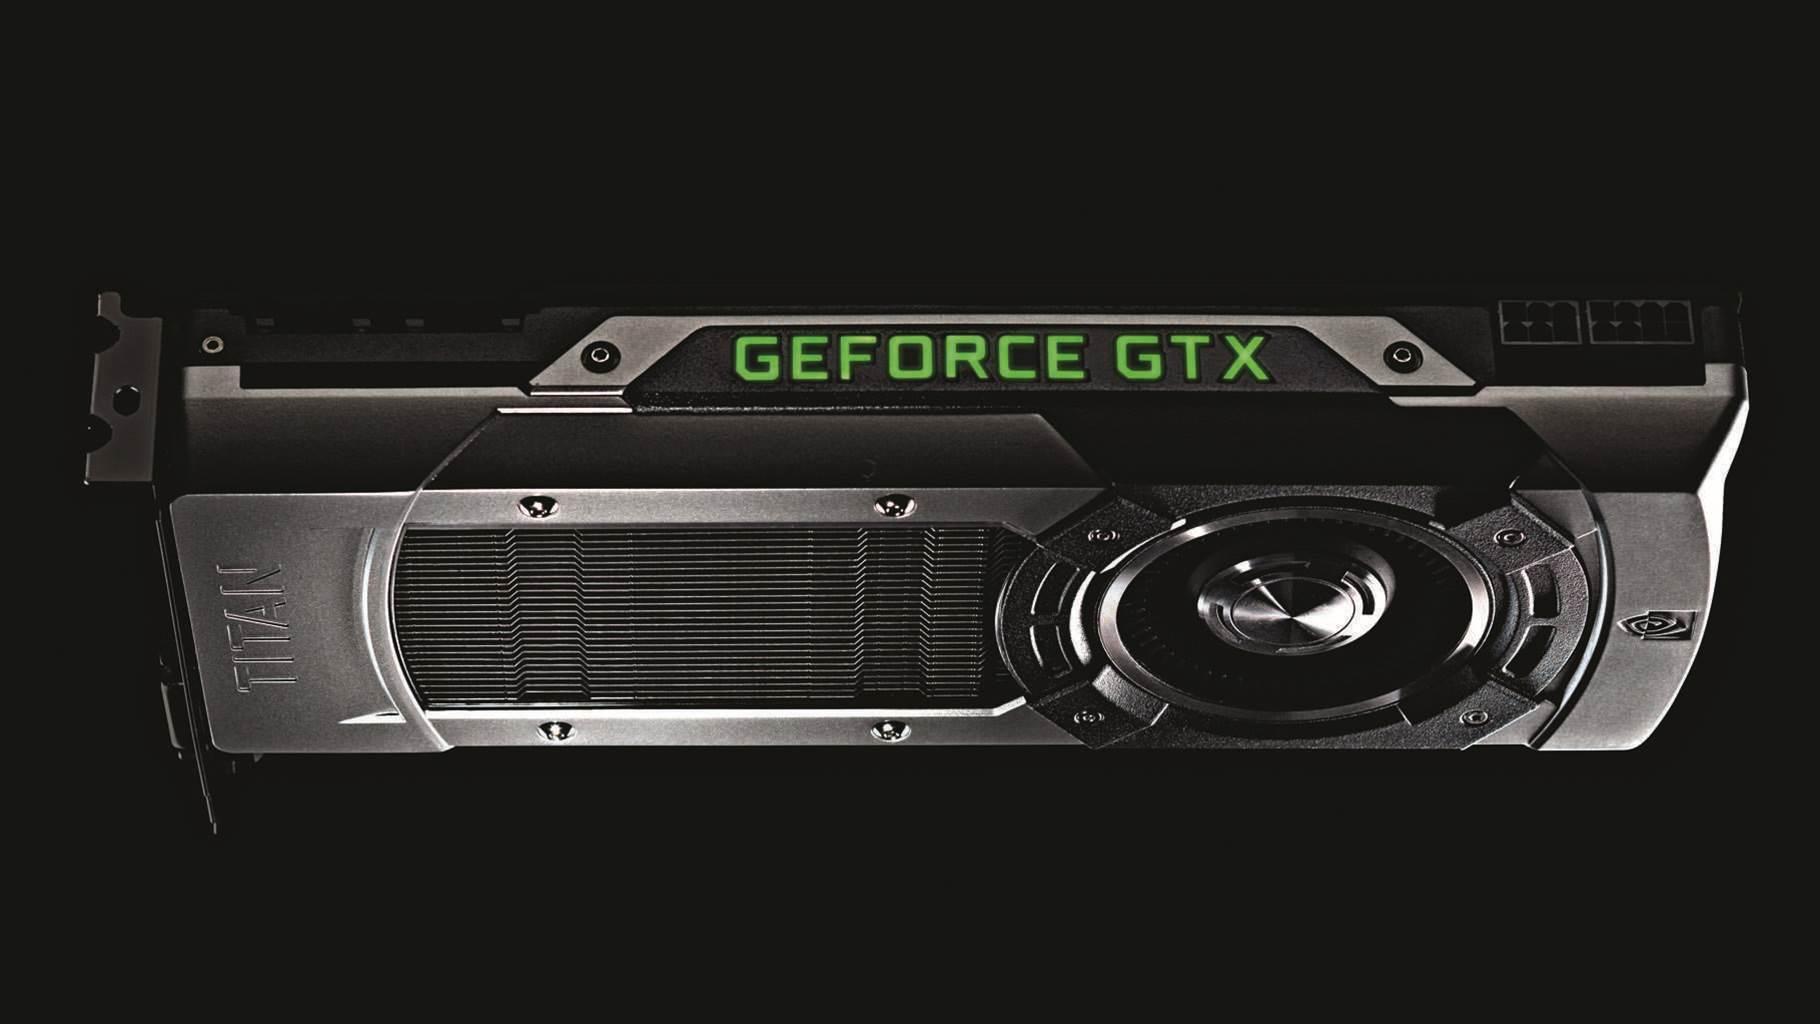 Review: GeForce GTX Titan